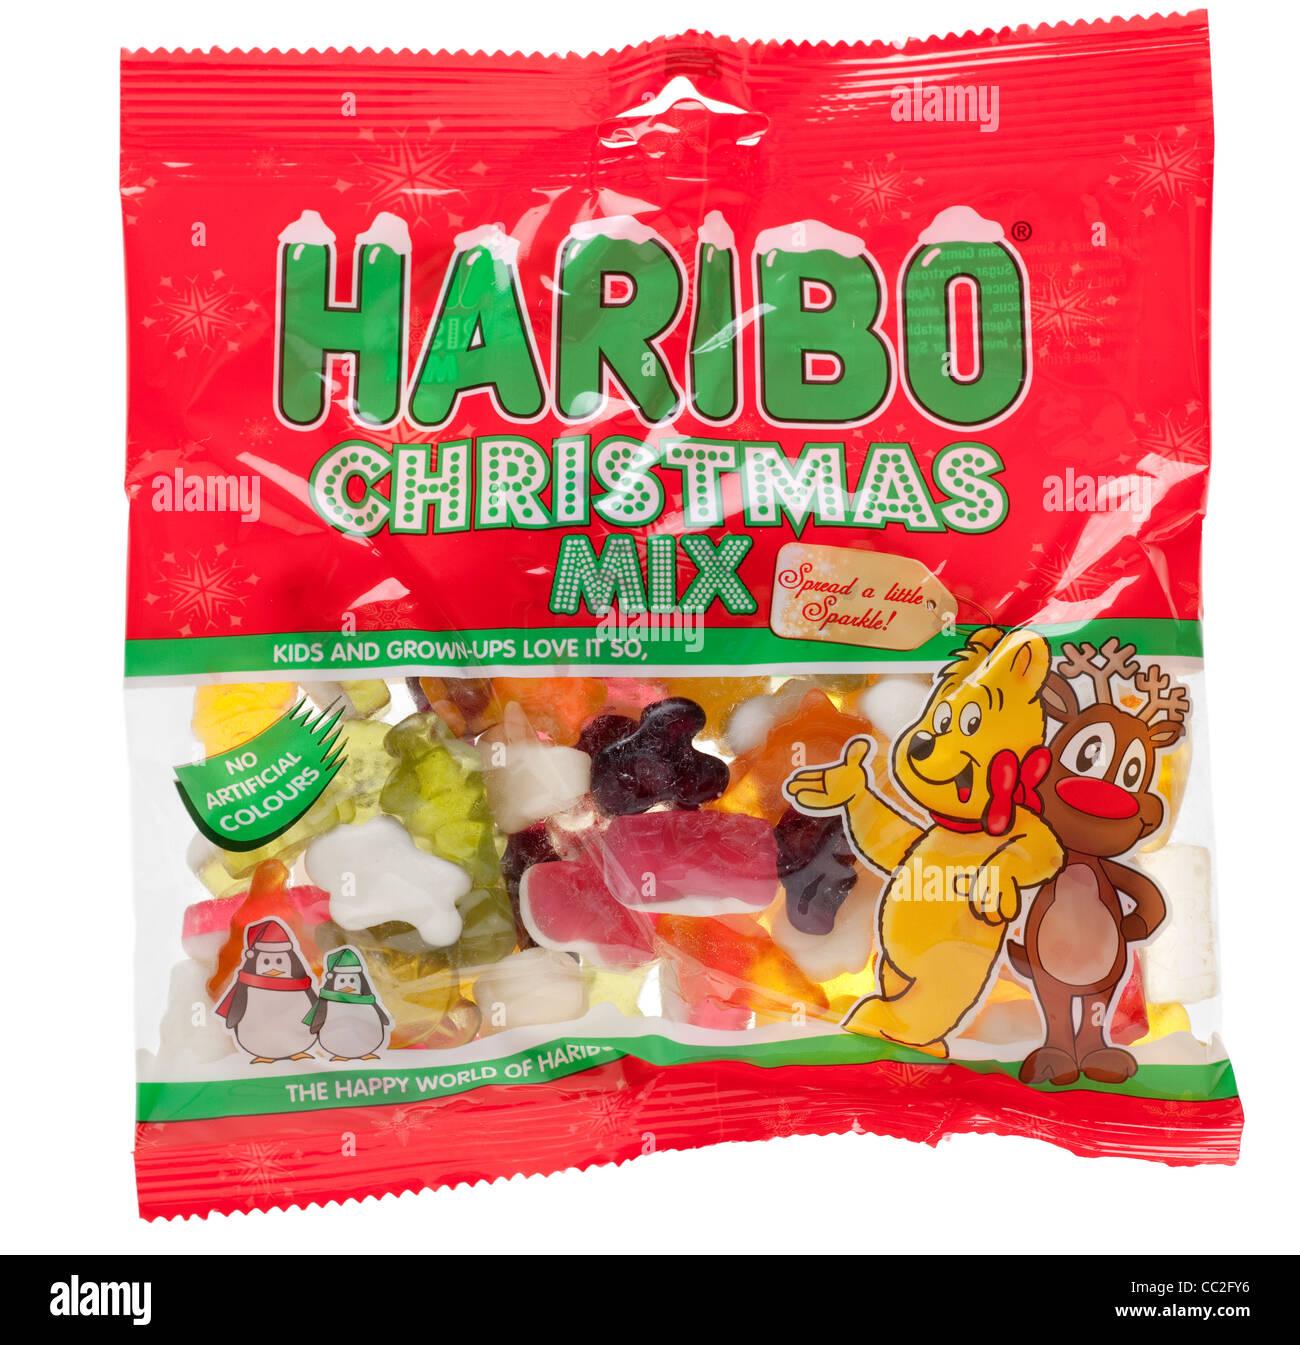 Haribo Christmas mix chews - Stock Image